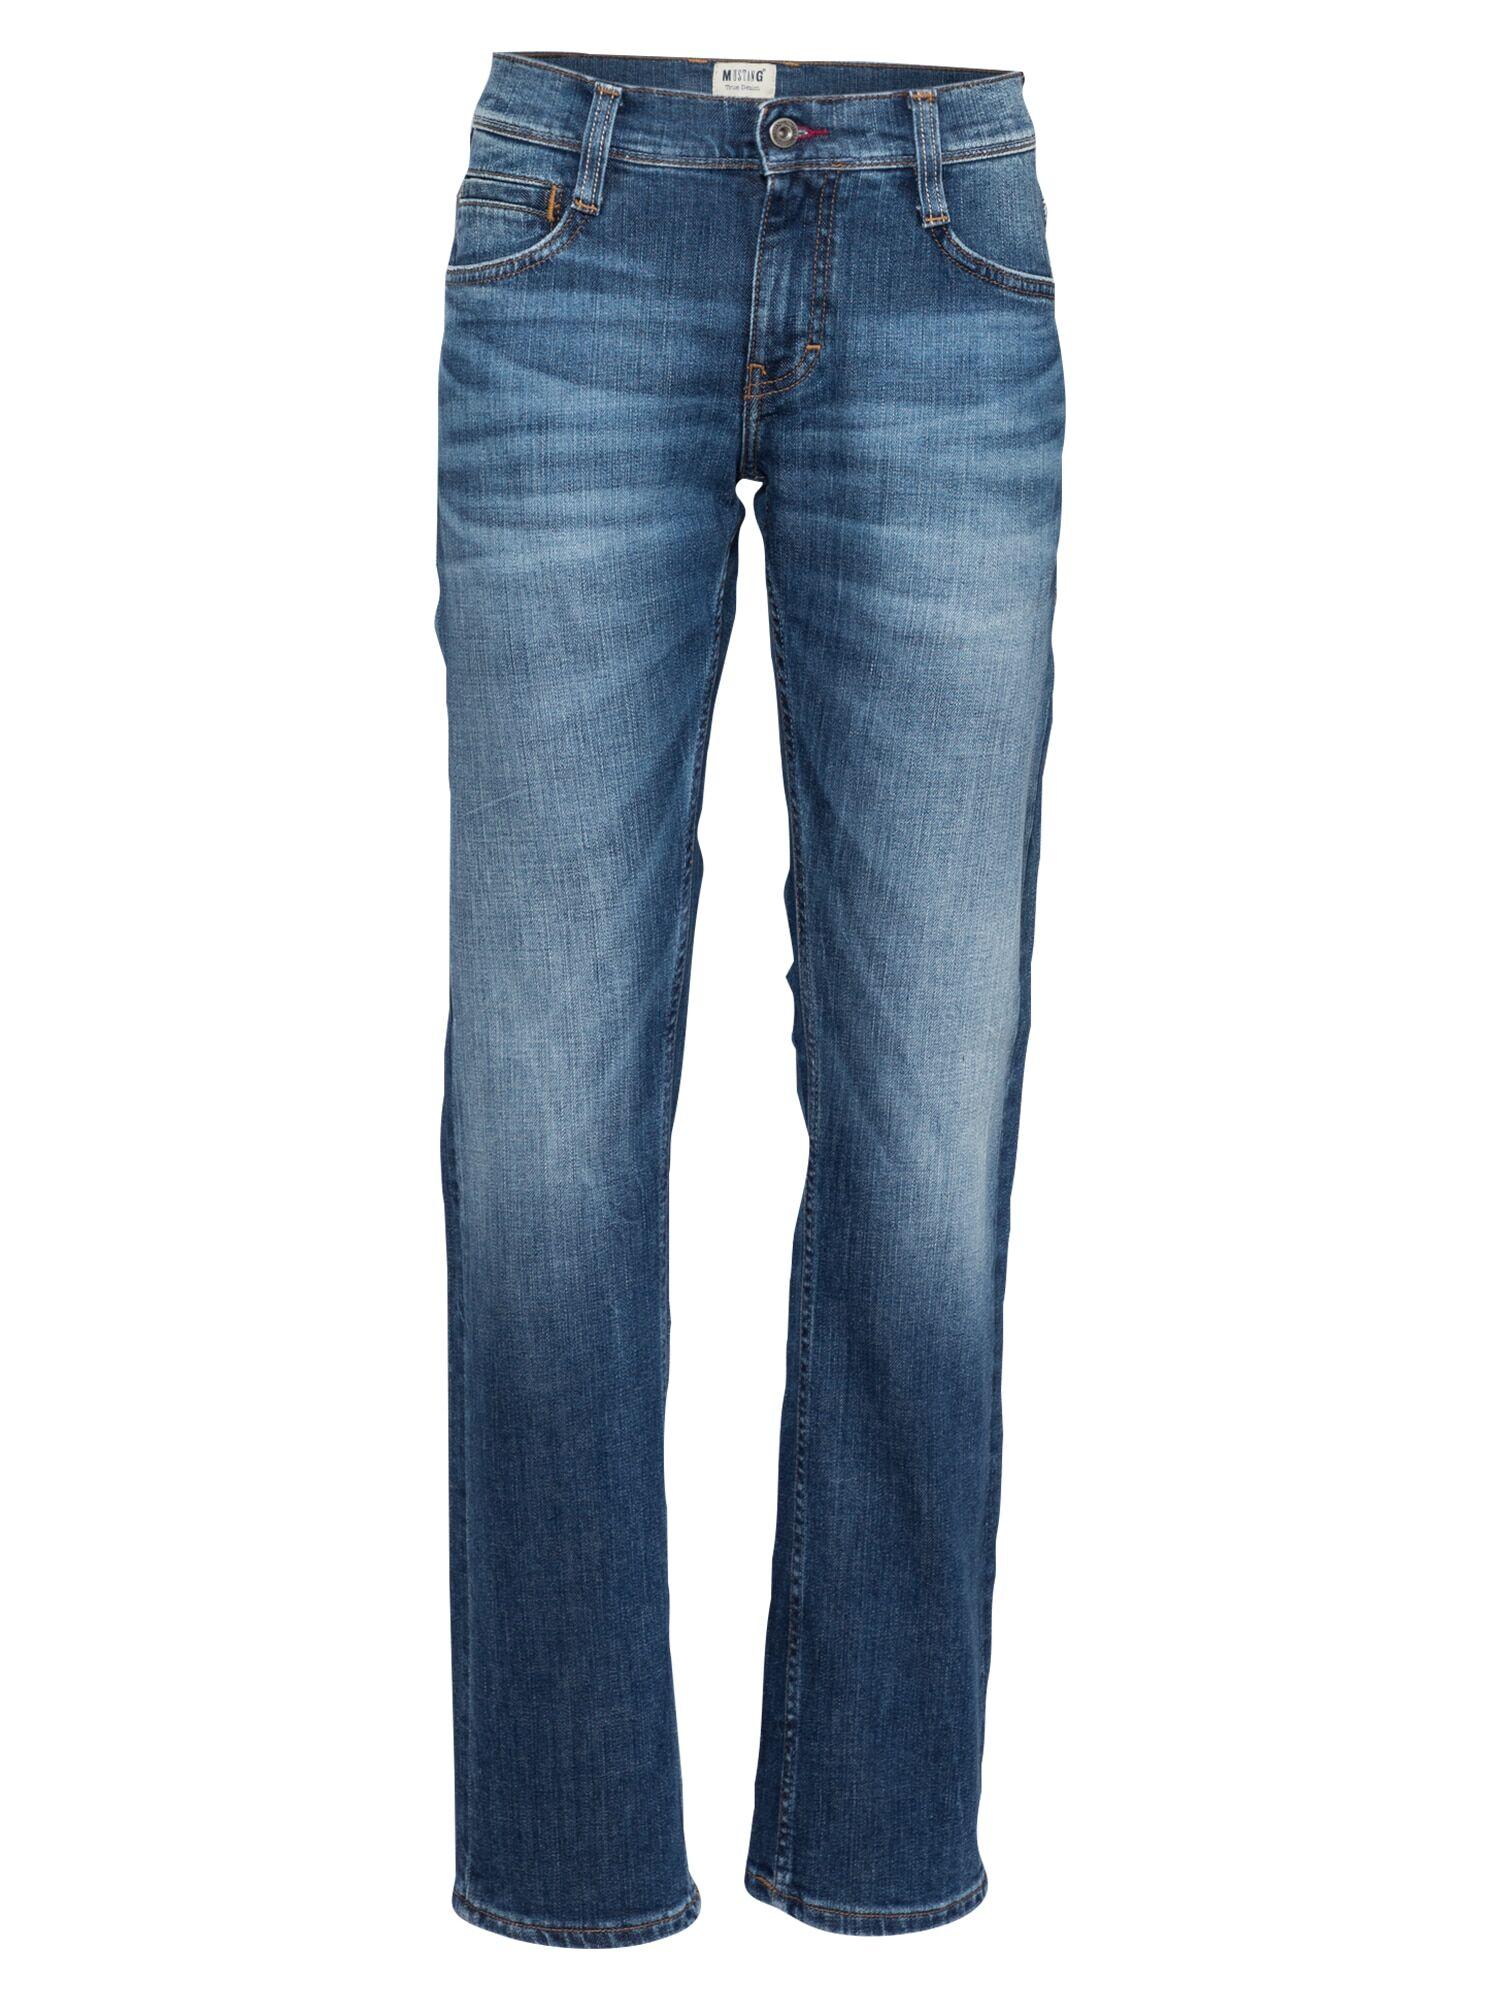 MUSTANG Jean 'Oregon '  - Bleu - Taille: 38 - male